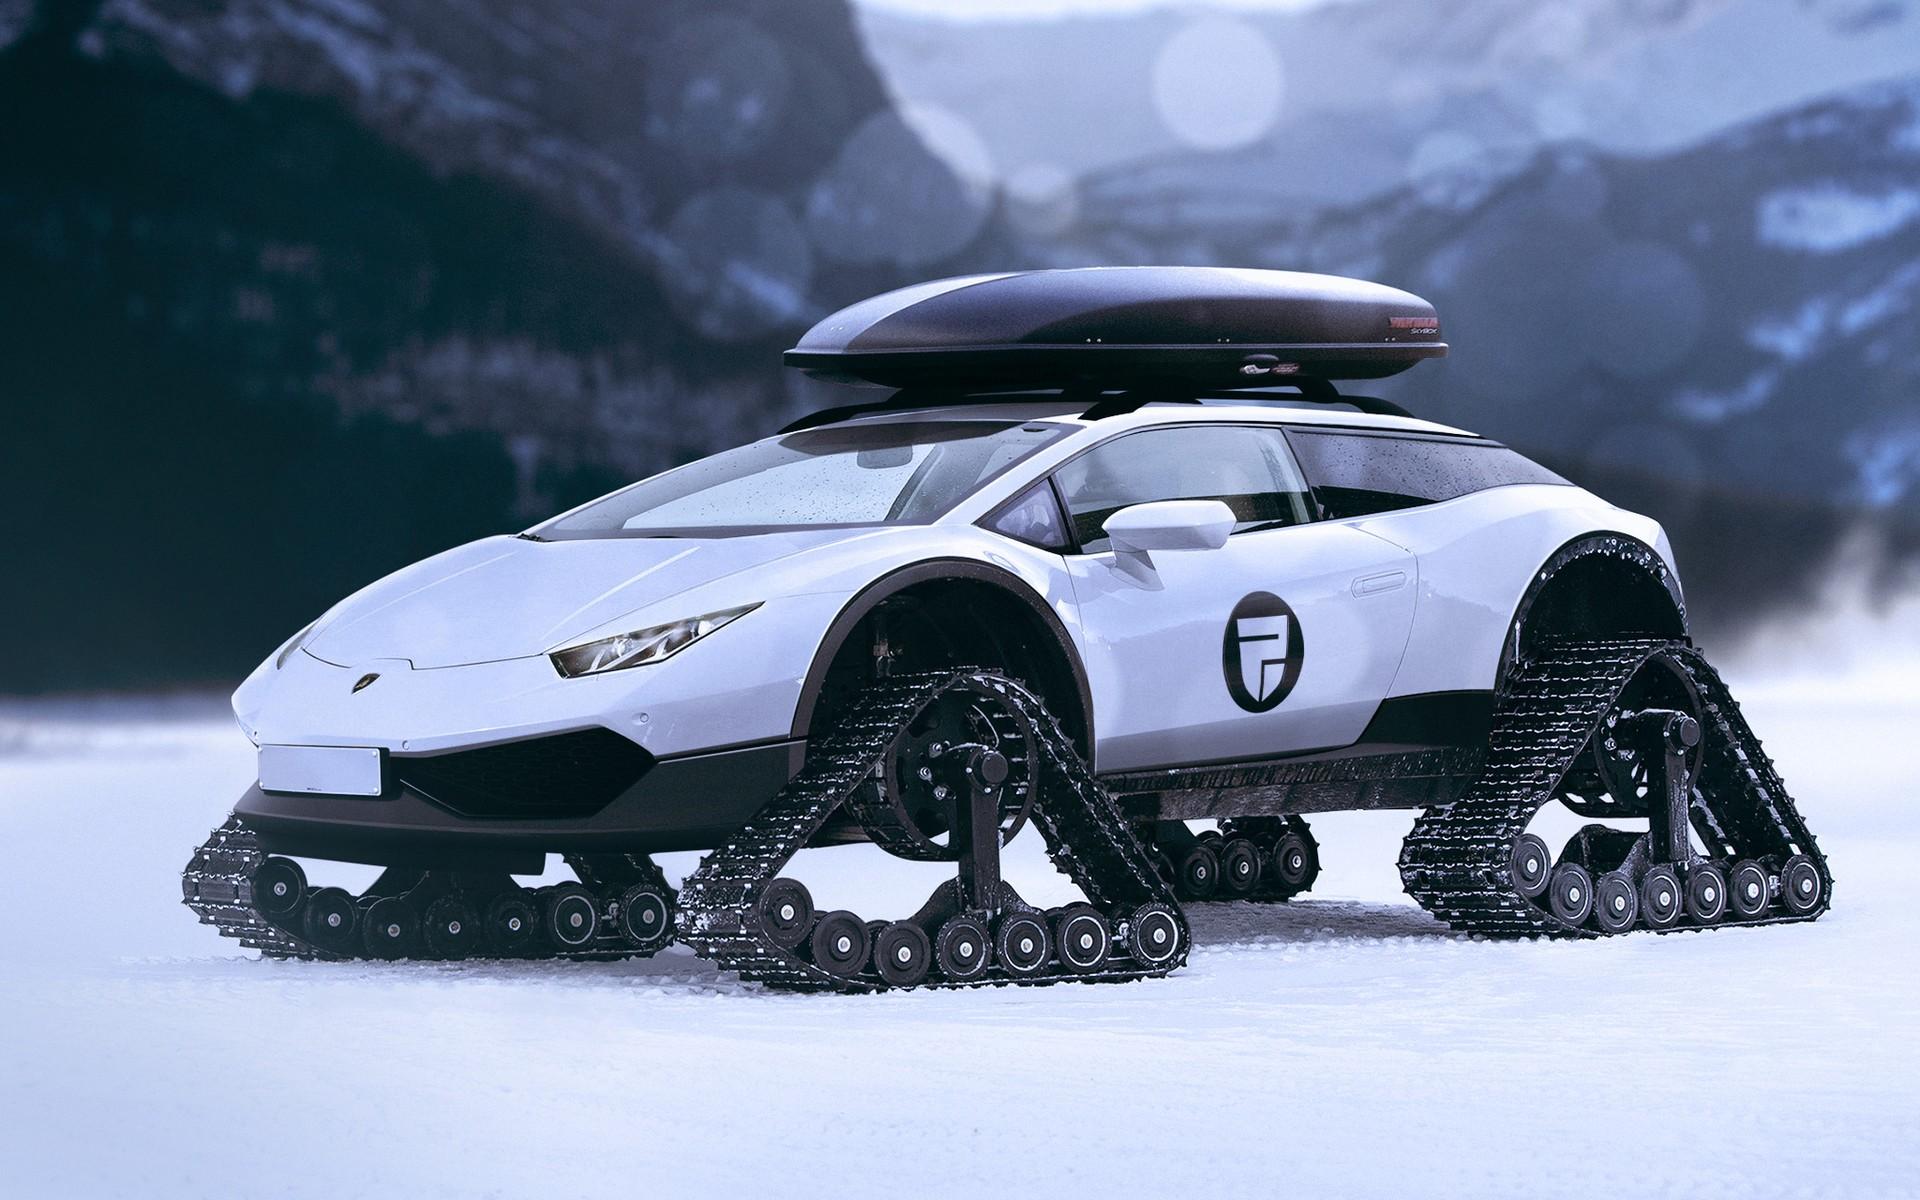 hintergrundbilder schnee konzept autos fahrzeug sportwagen wei e autos lamborghini. Black Bedroom Furniture Sets. Home Design Ideas